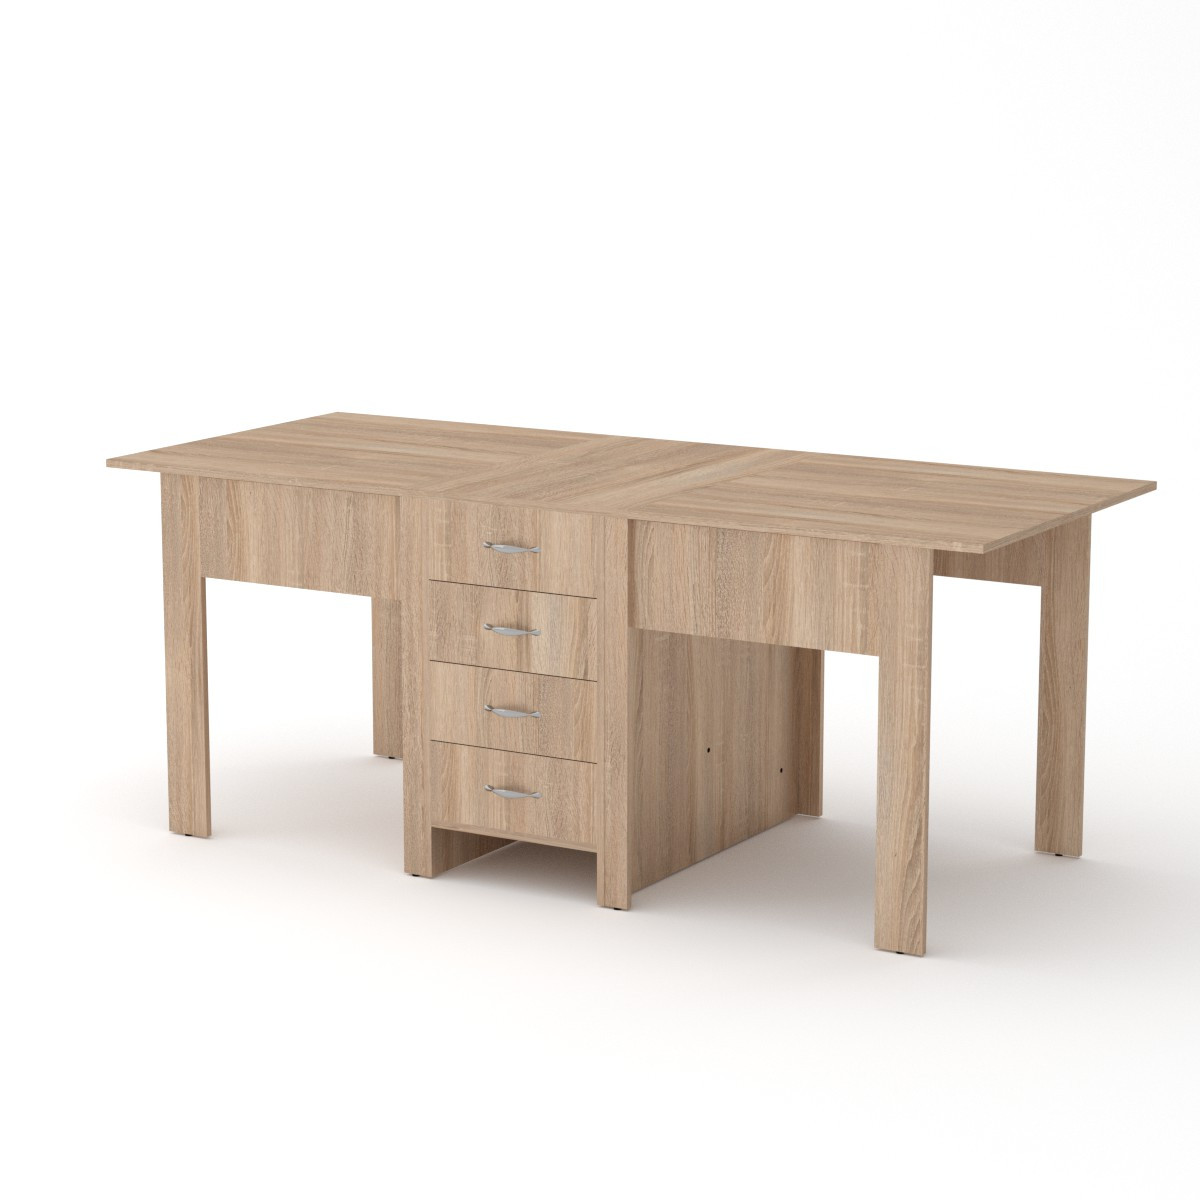 Стол книжка 3 дуб сонома Компанит (190х53х75 см)